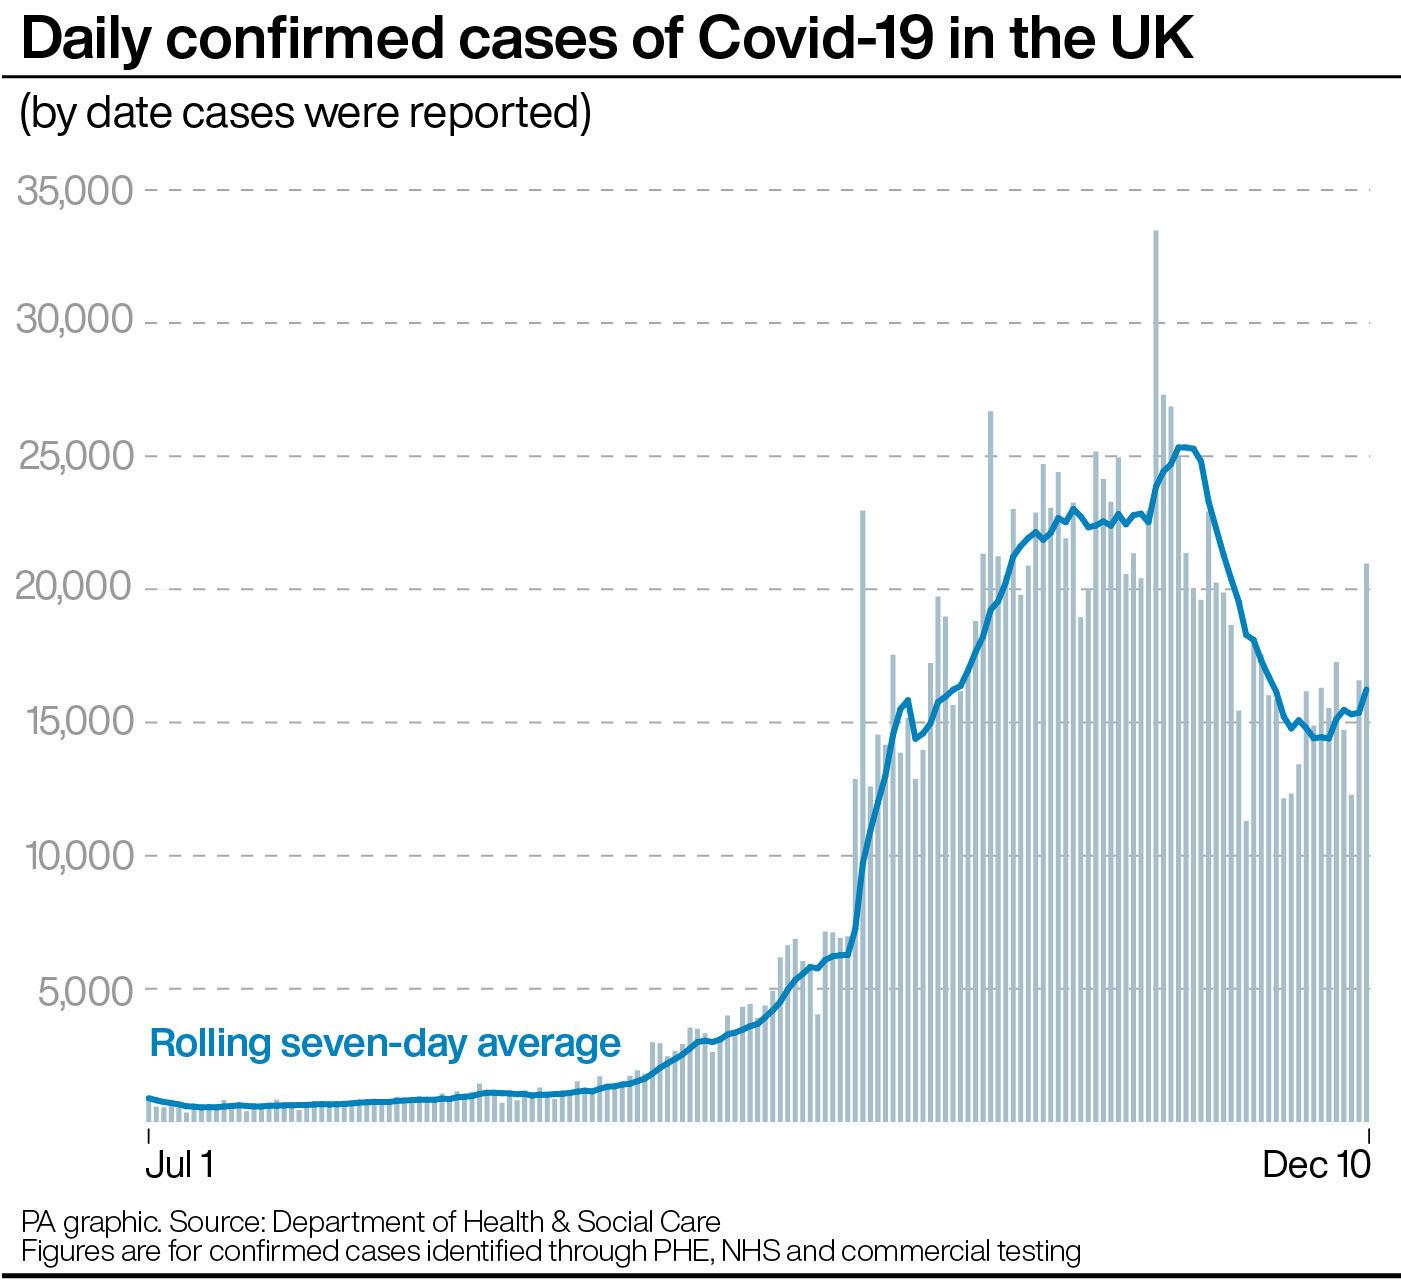 United Kingdom coronavirus self-isolation period reduced to 10 days